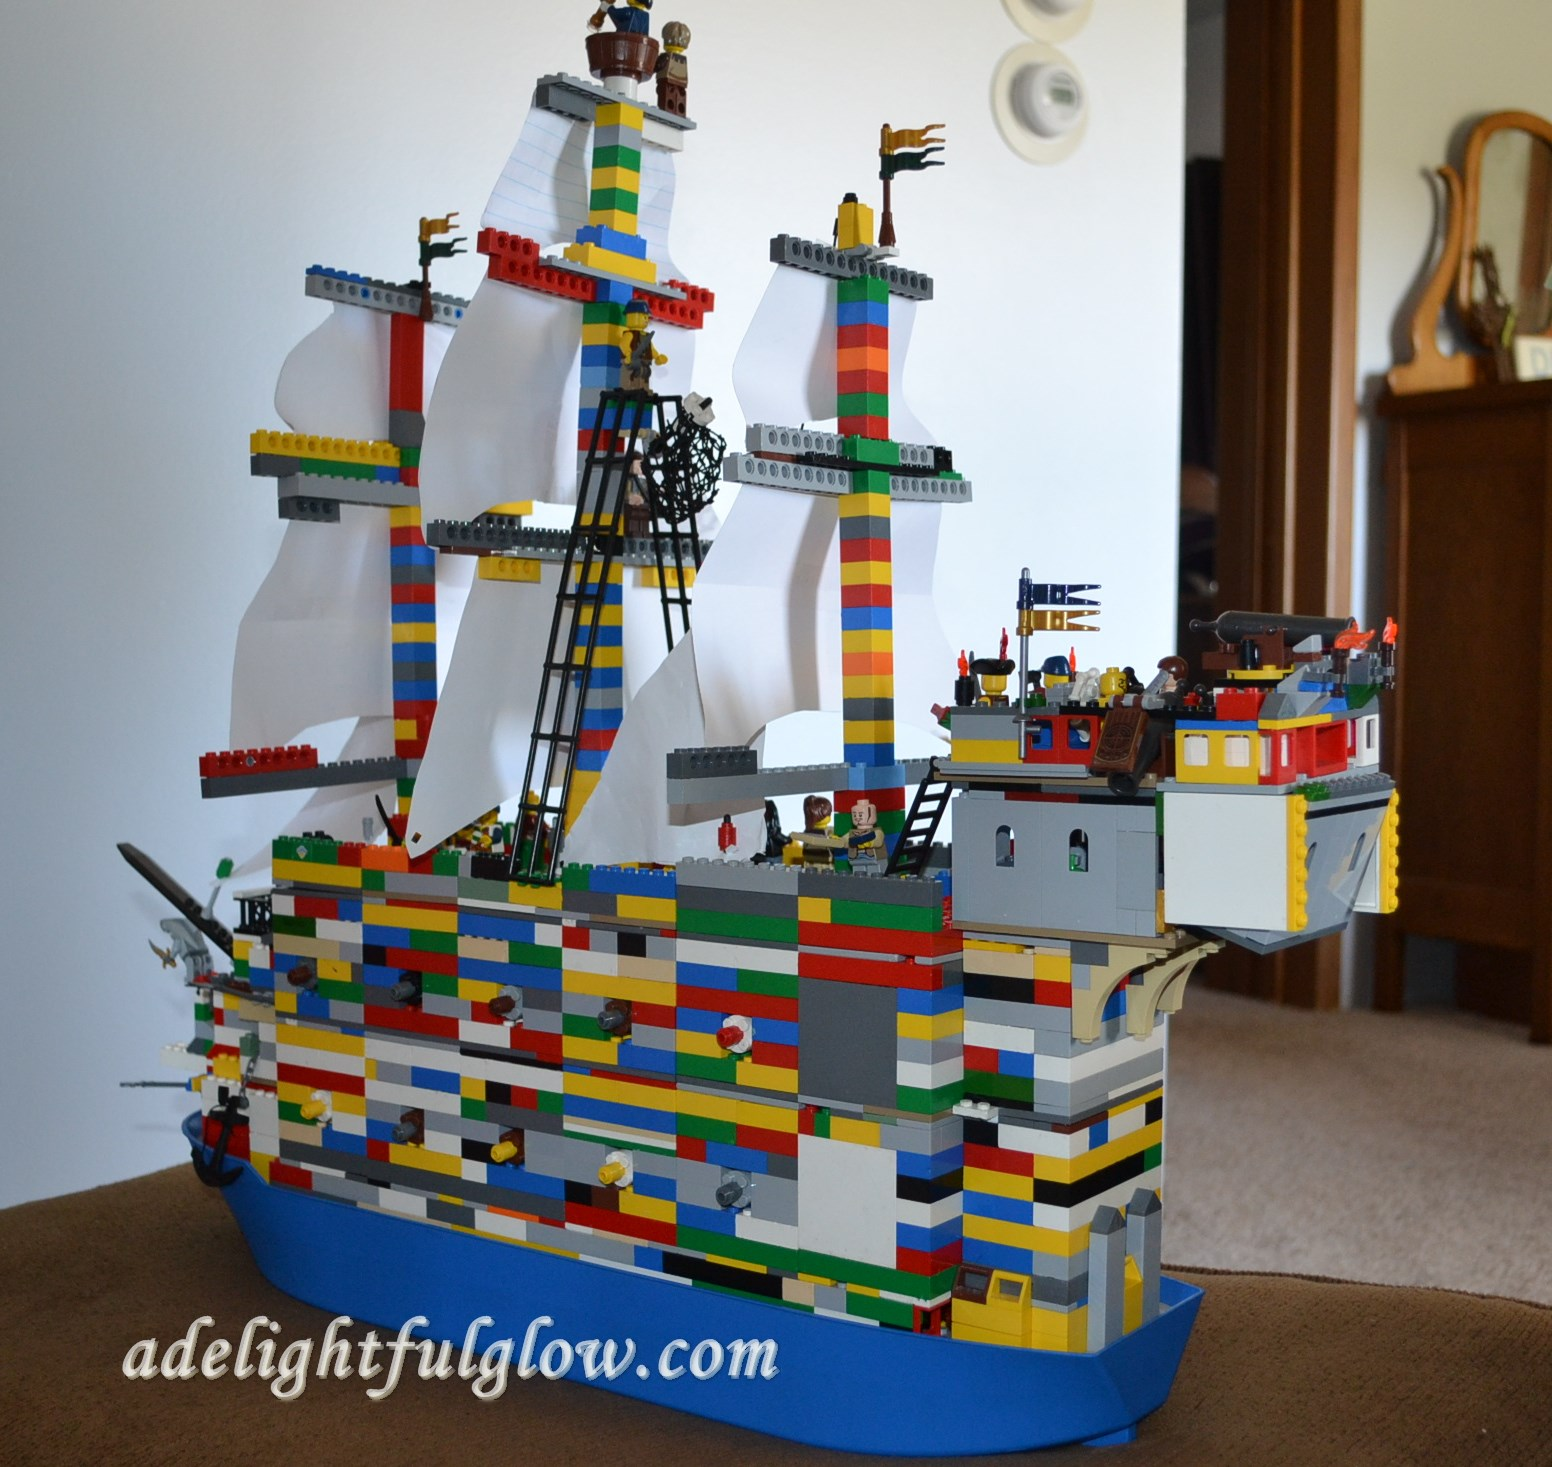 Lego Pirate Ship A Delightful Glow